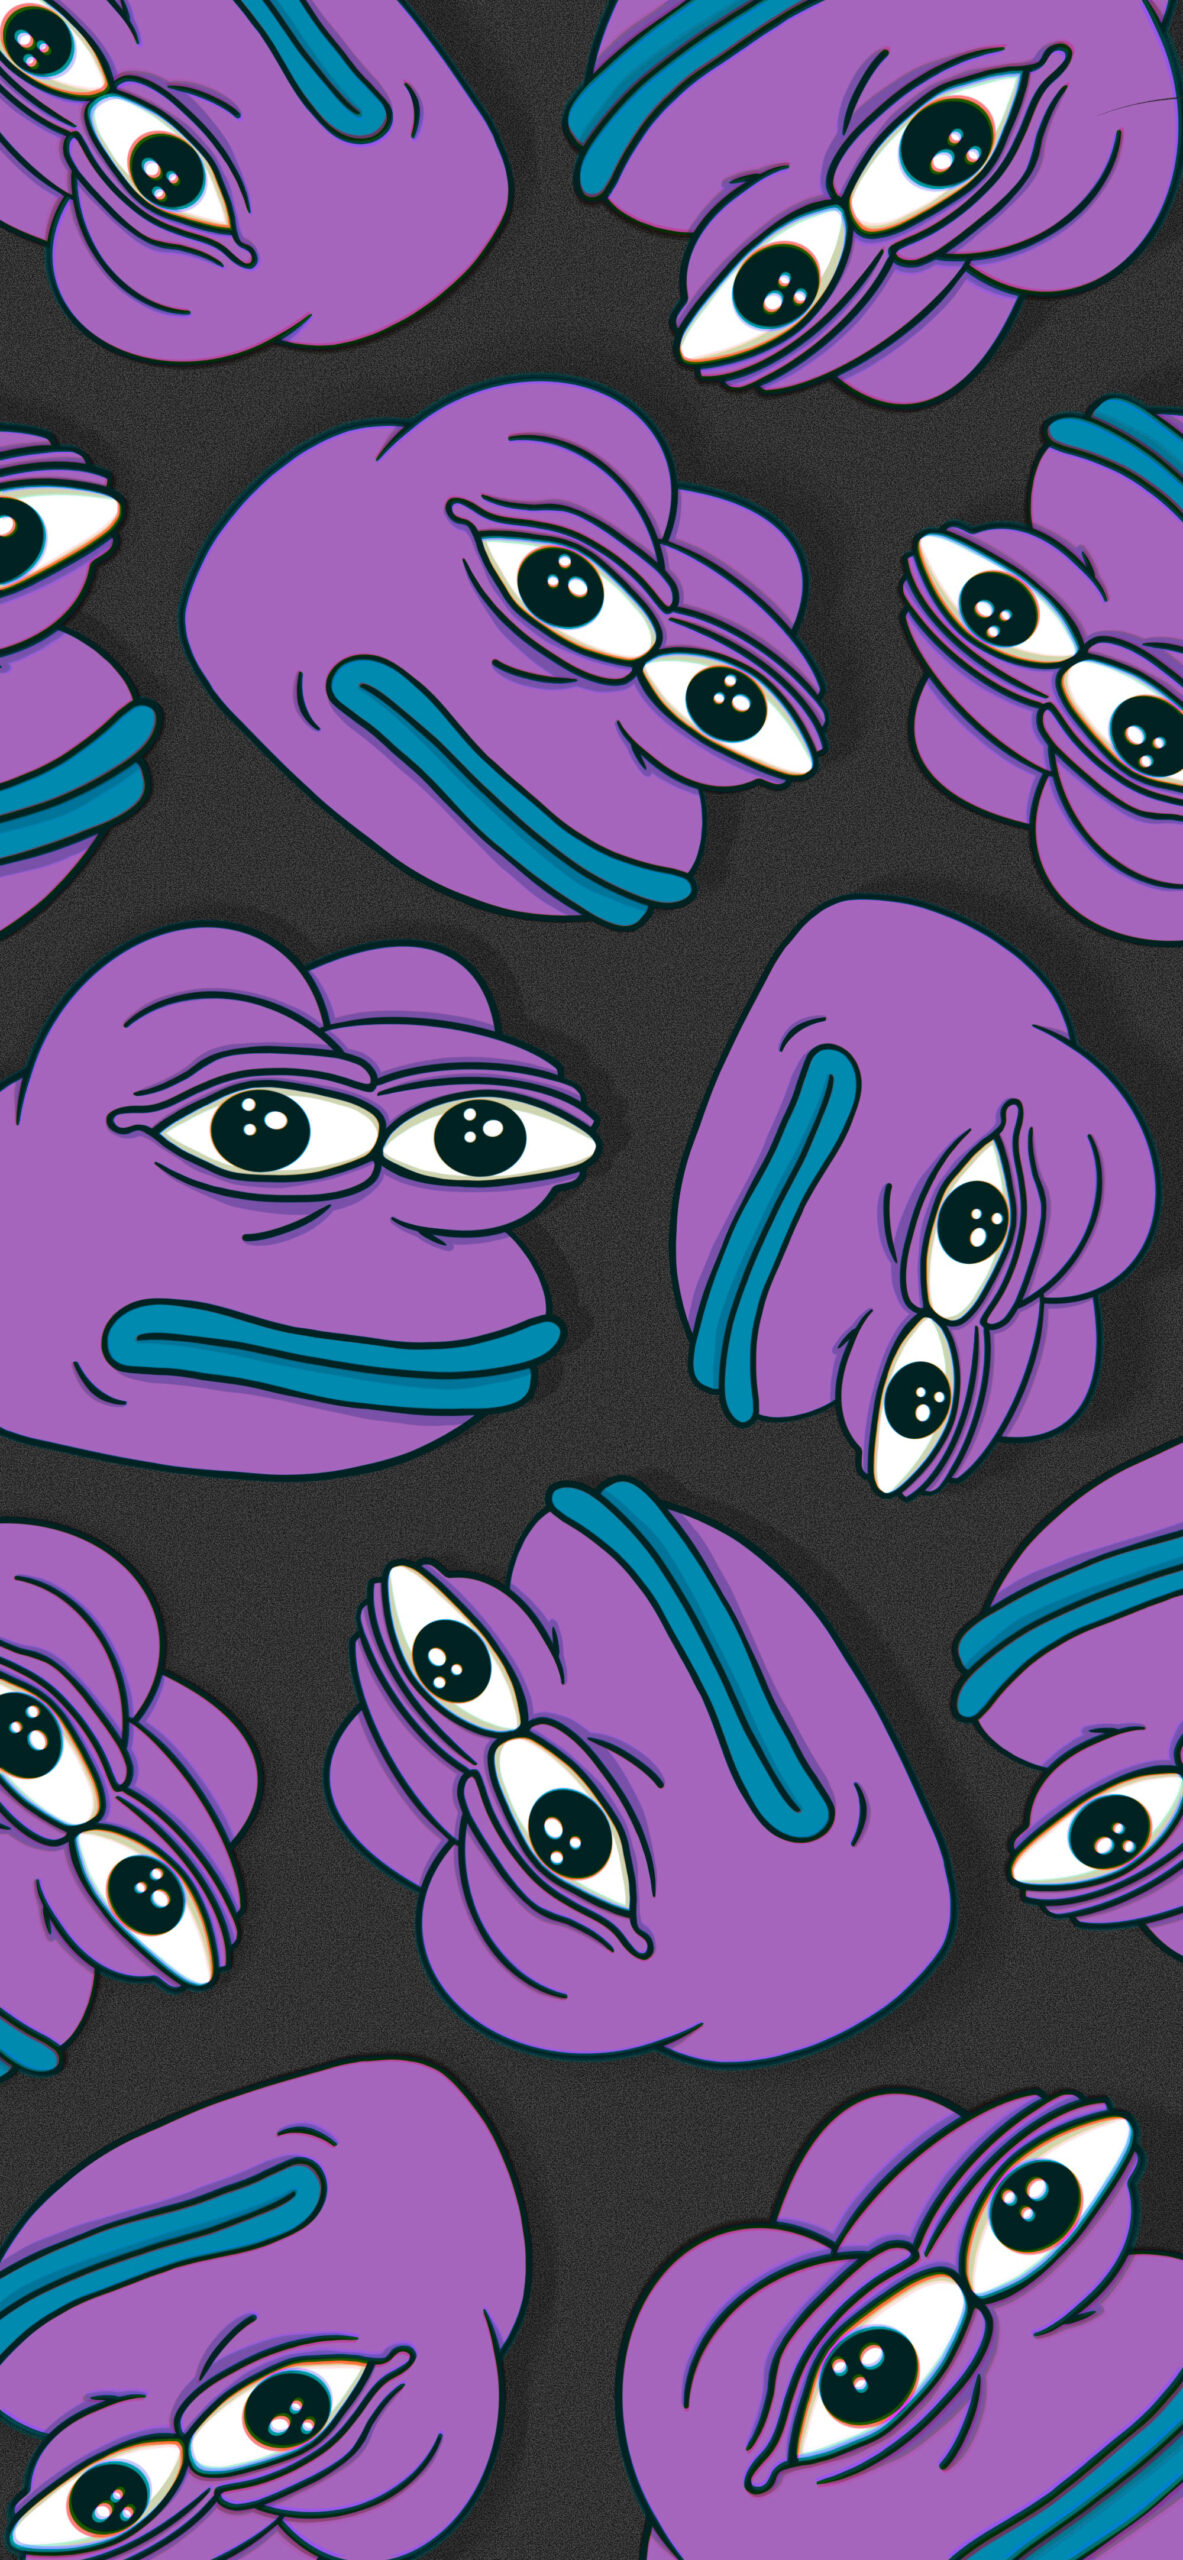 pepe the frog black meme wallpaper 2